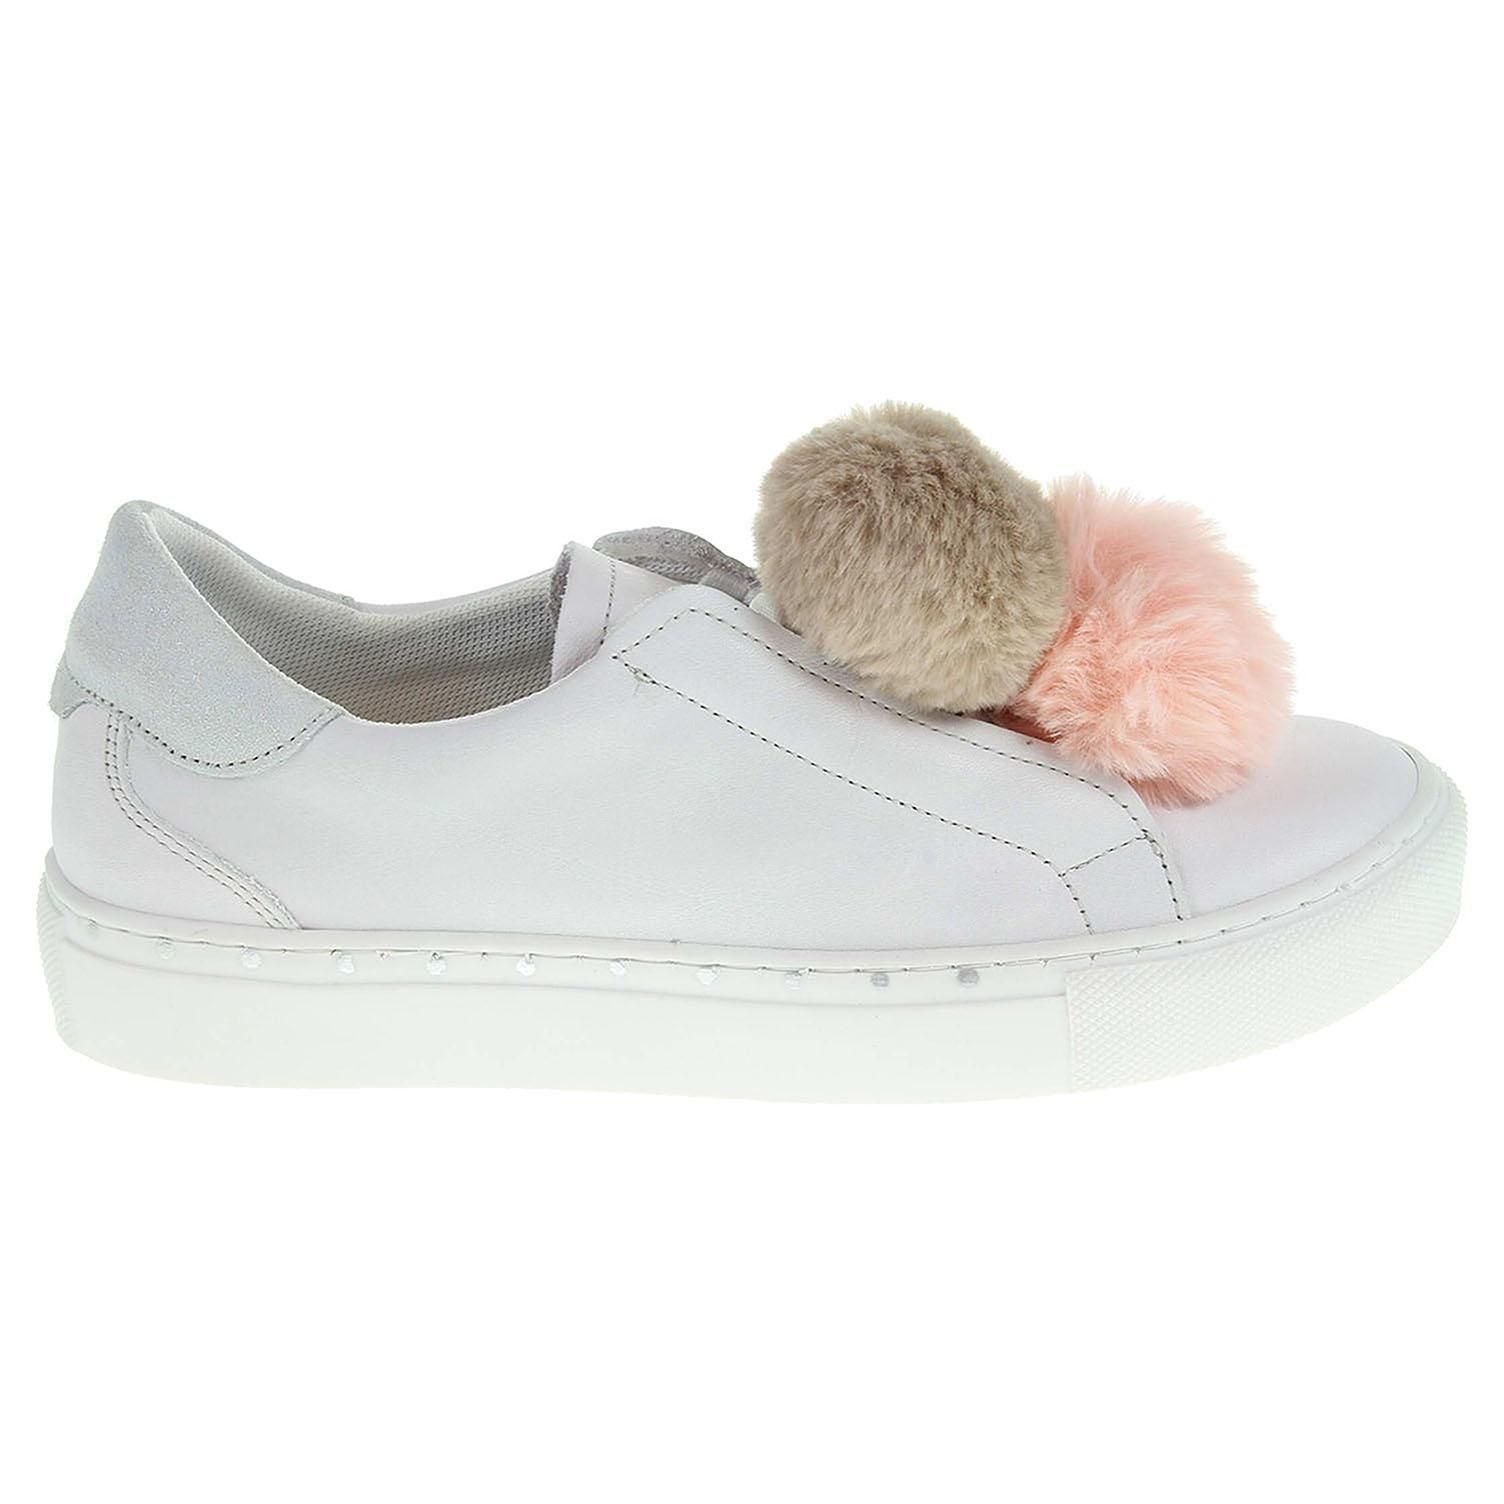 Tamaris dámská obuv 1-23734-38 bílá 40 9916fb1e7b0